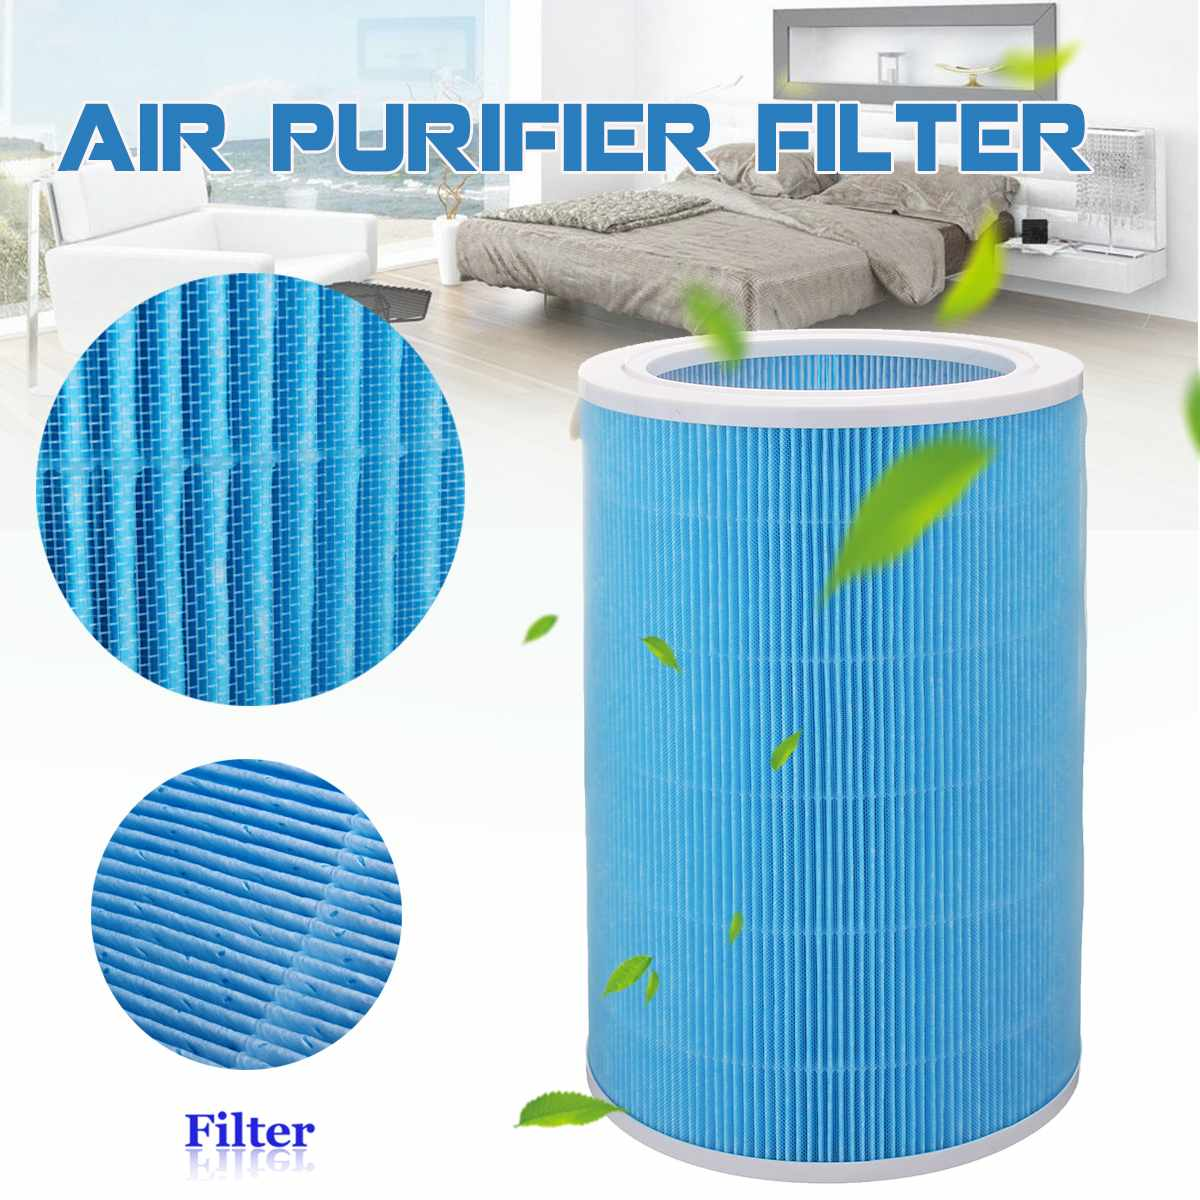 PM2.5 Air Purifier Filter Replacement For Xiaomi 1 2 Gen 2S Pro Air Purifier Formaldehyde Remover Filter